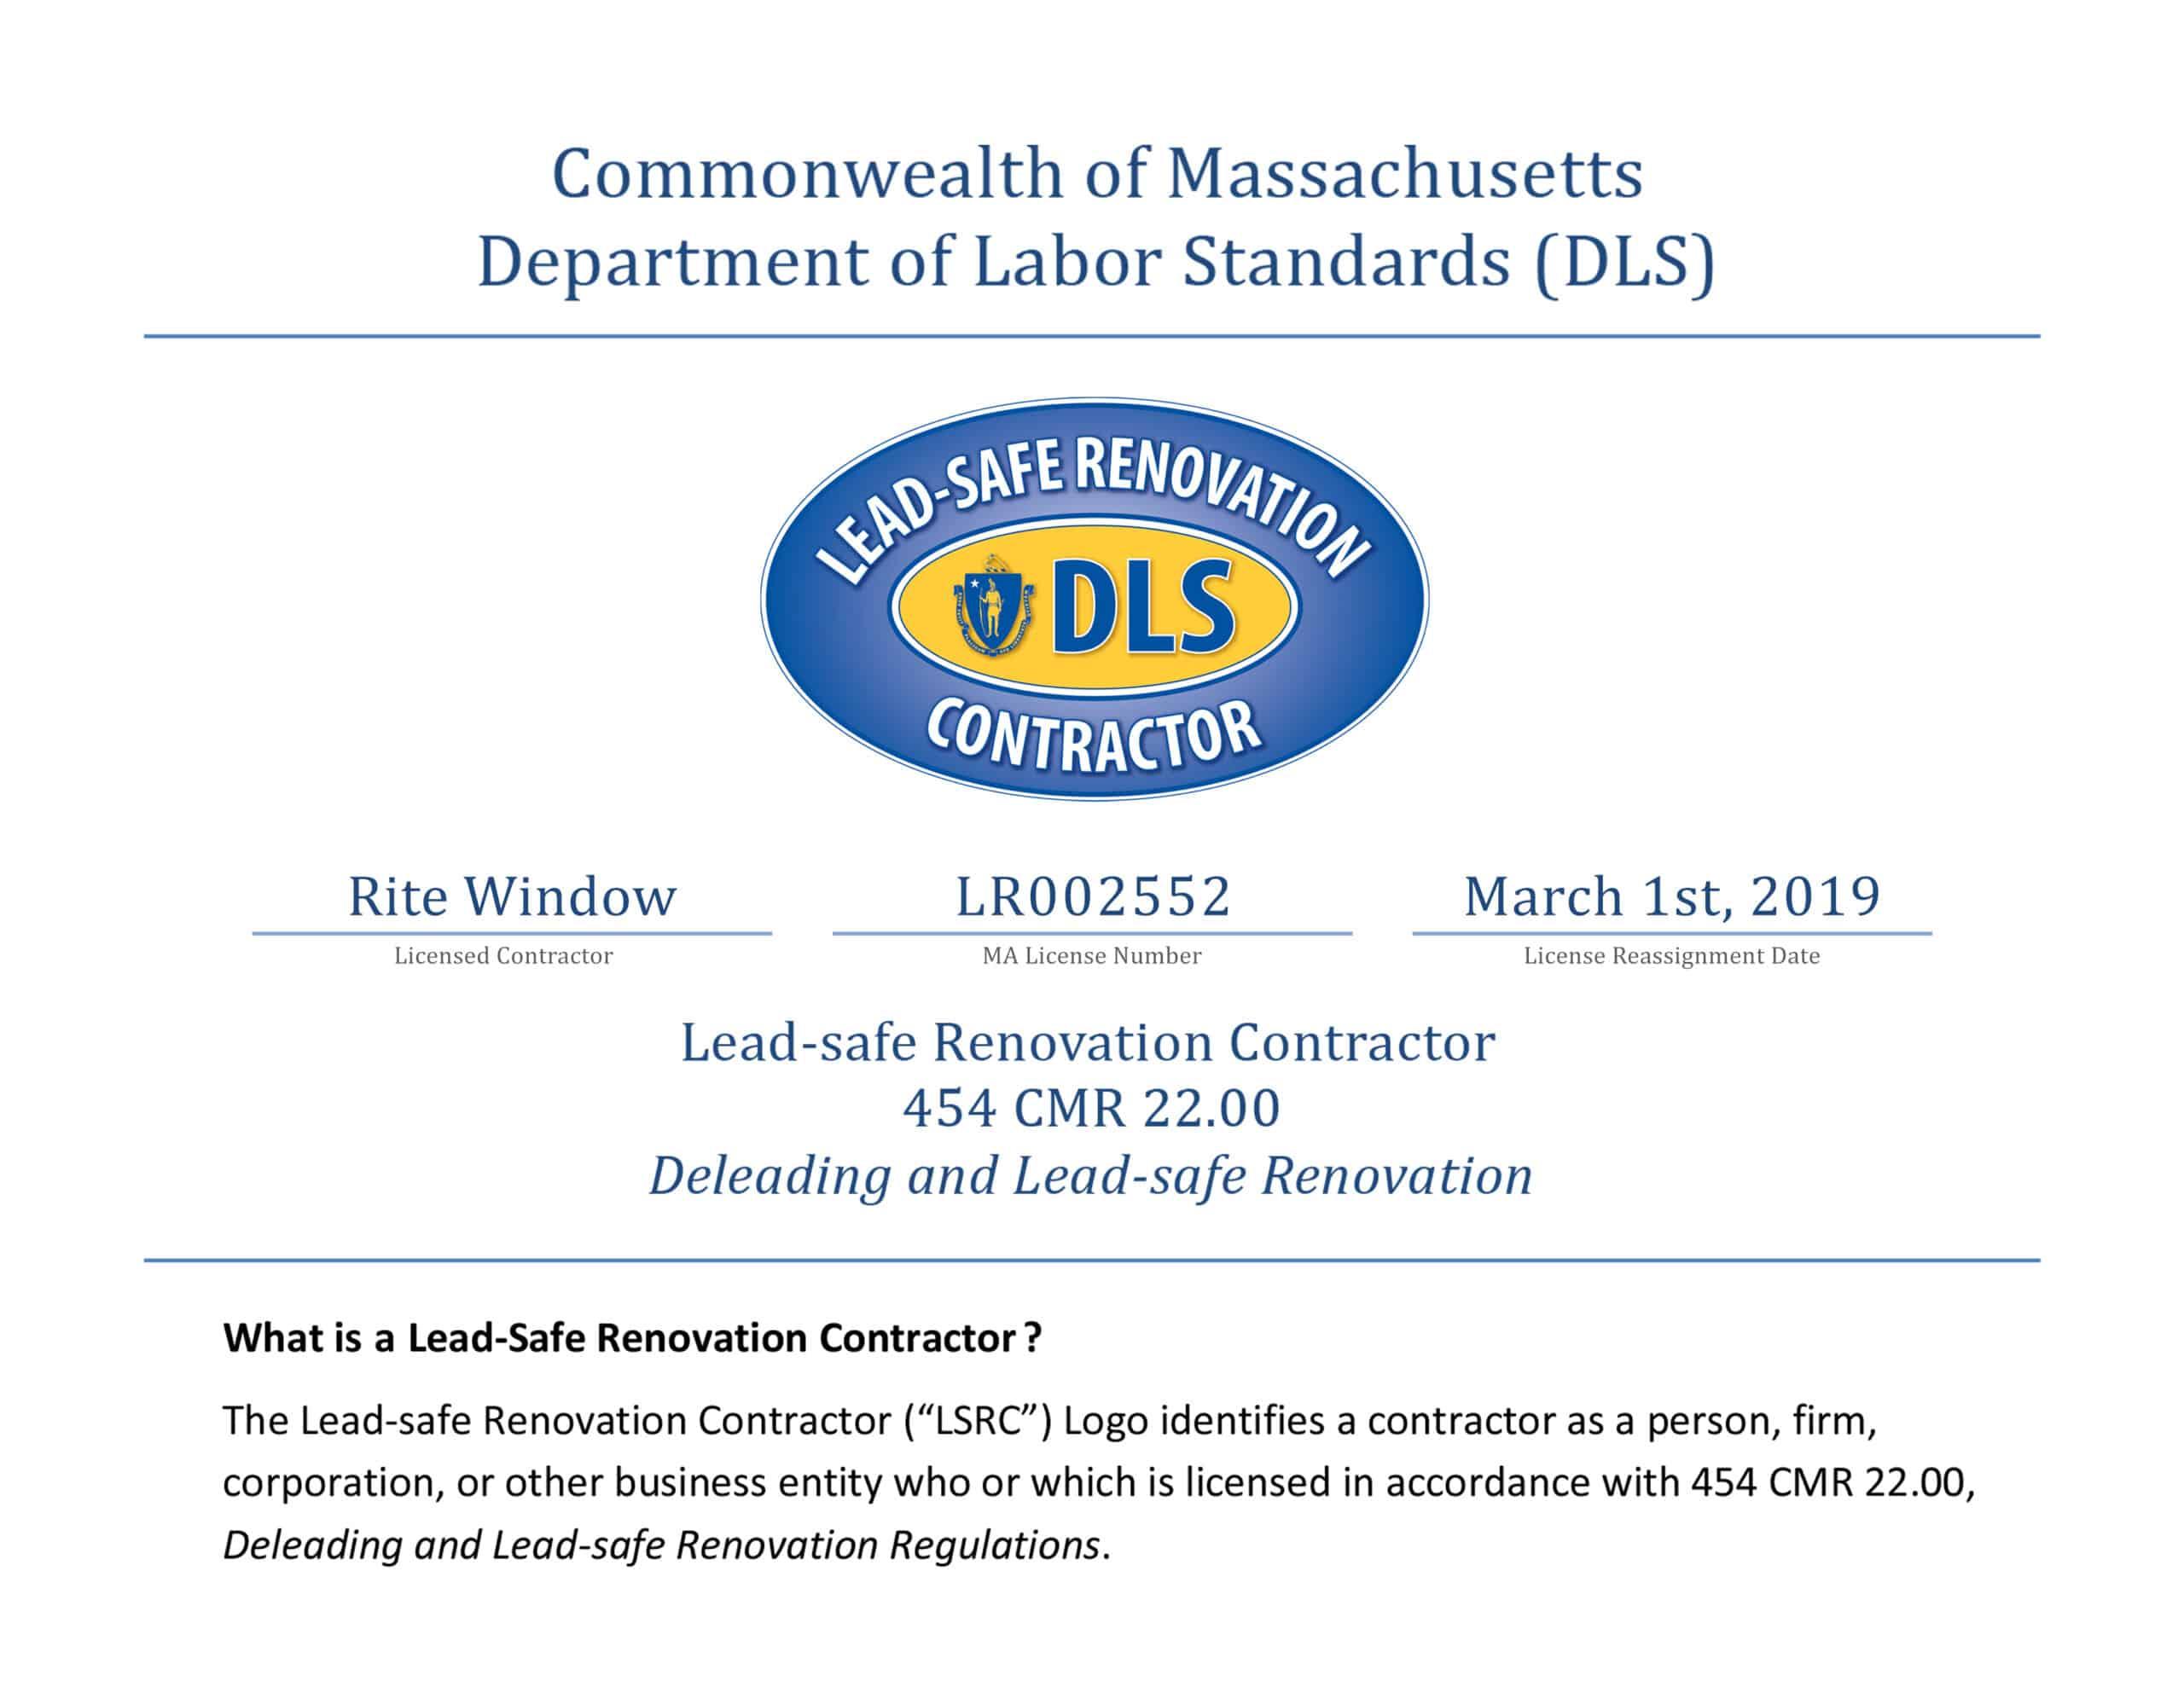 rite window reviews chiconstpoets epa certified as leadsafe licensed contractor customer reviews testimonials rite window